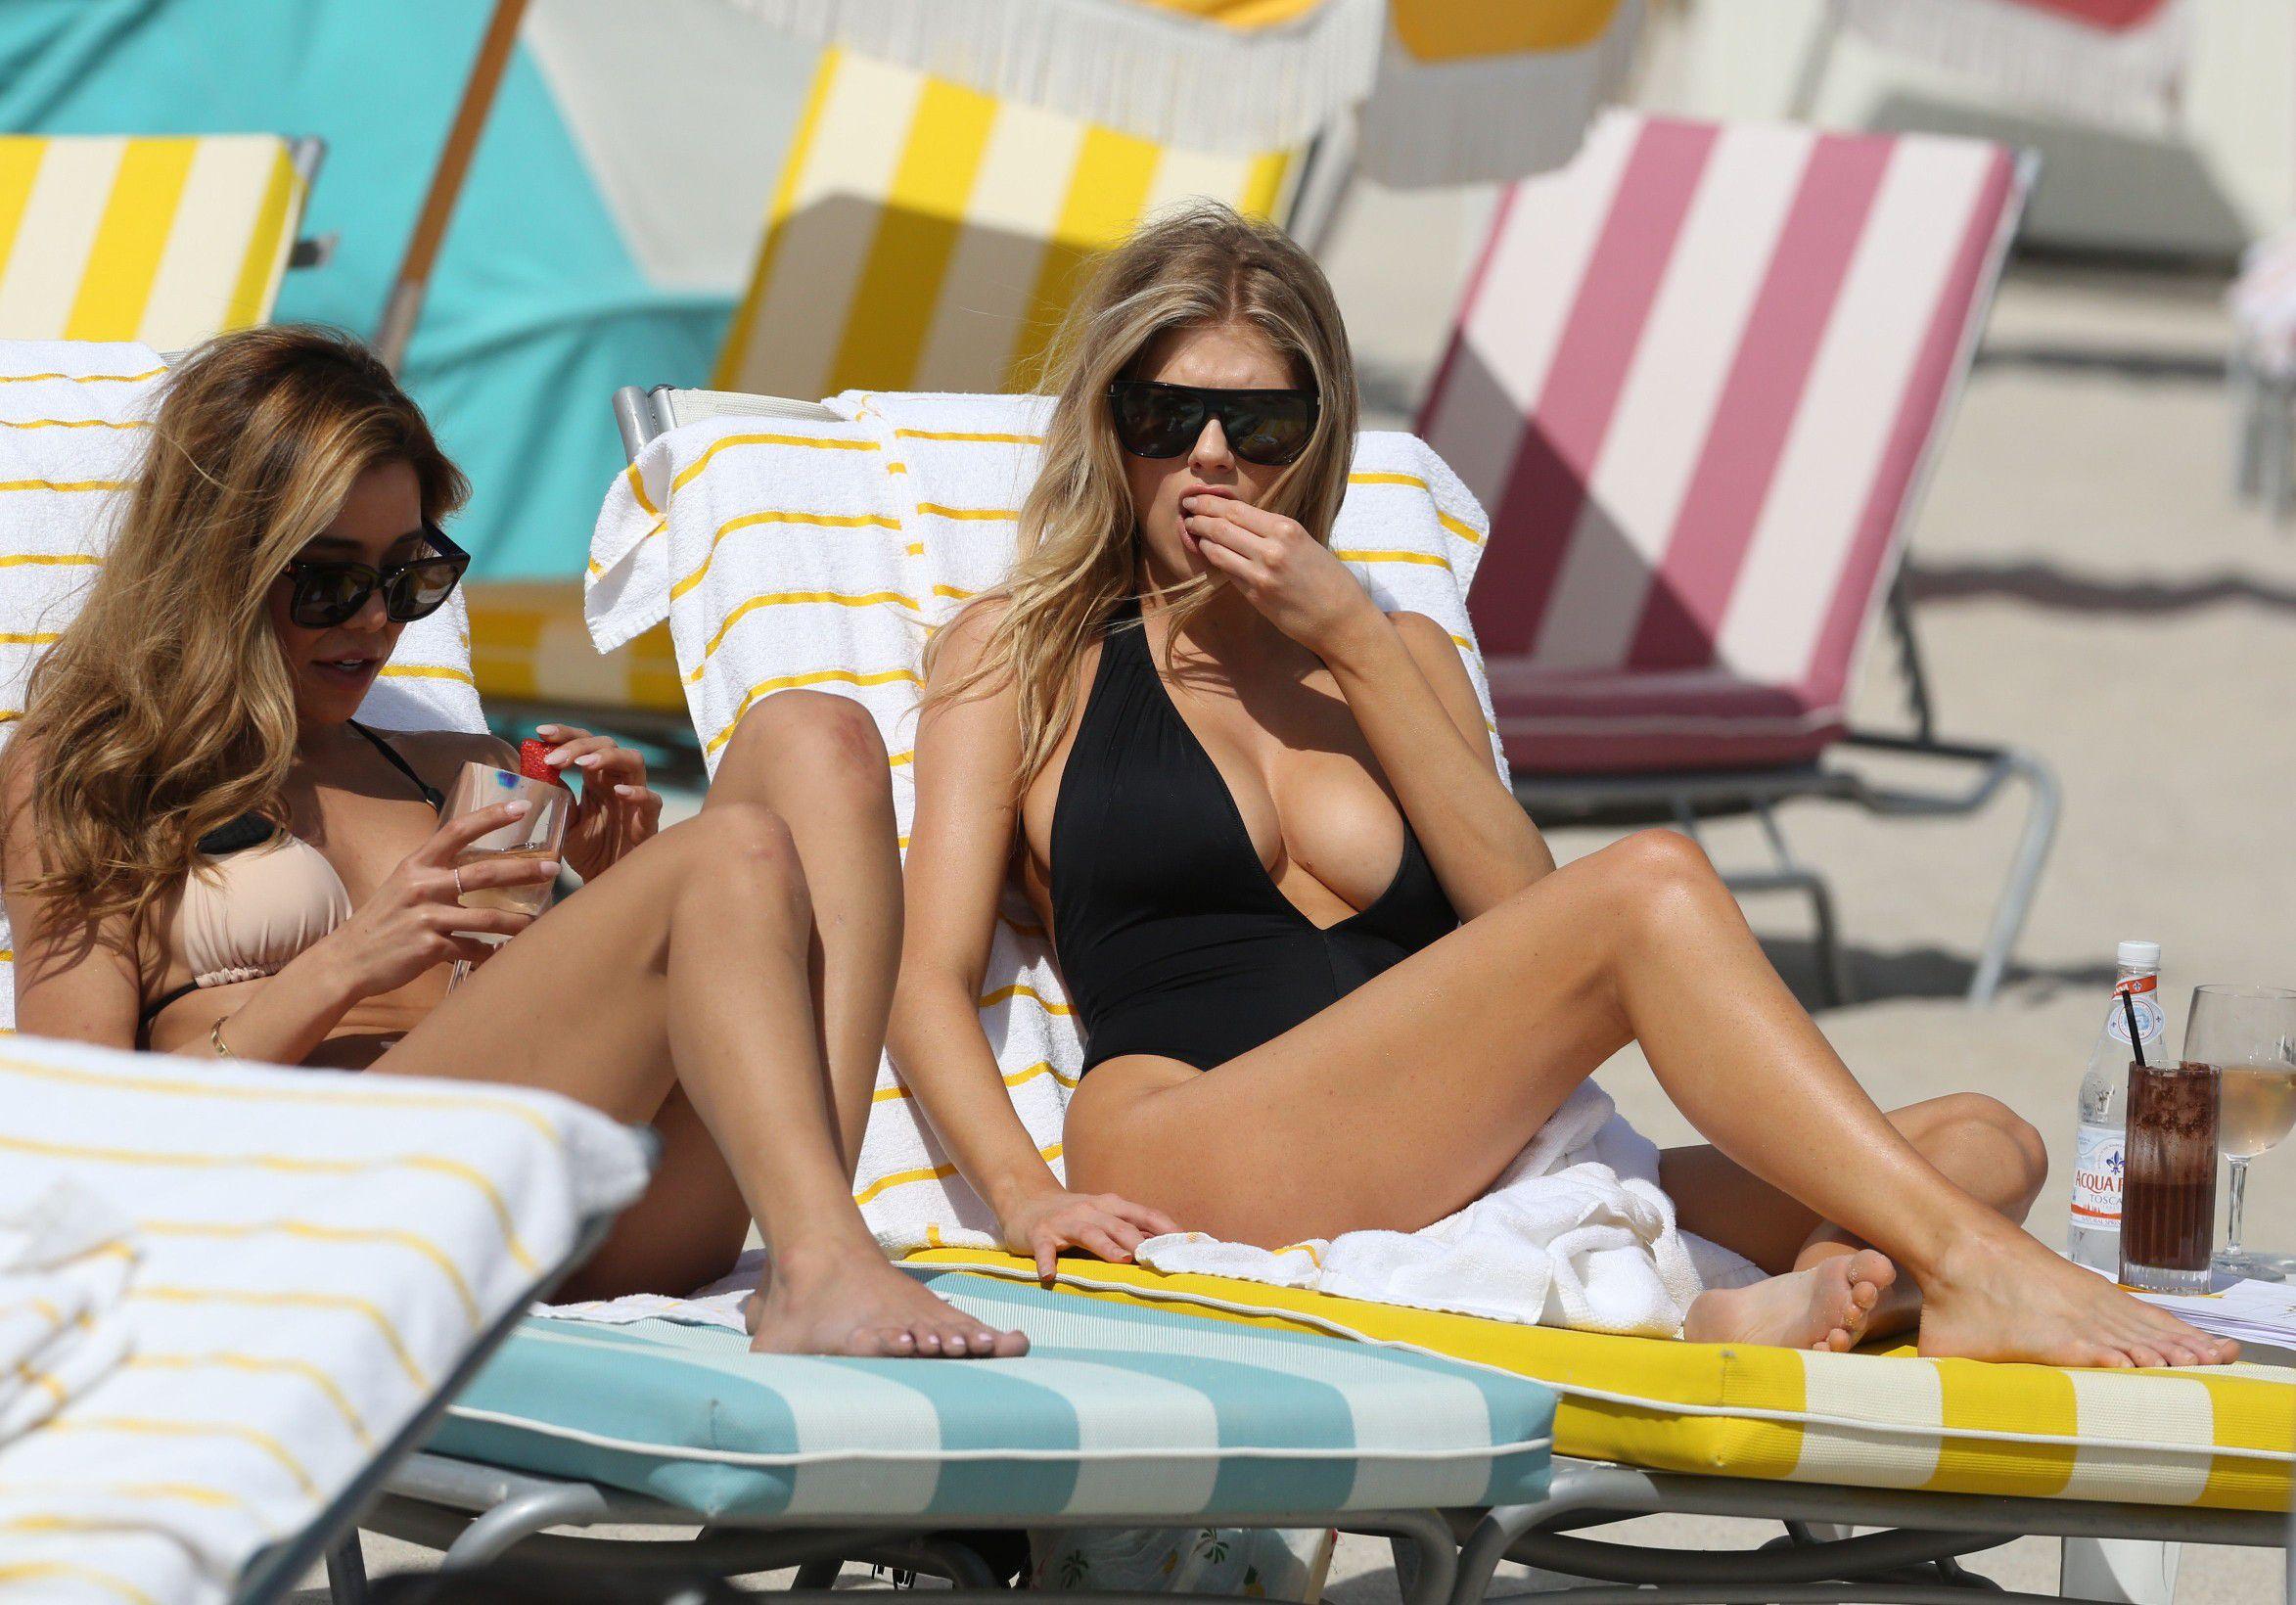 charlotte-mckinney-nipple-slip-at-the-beach-in-miami-12